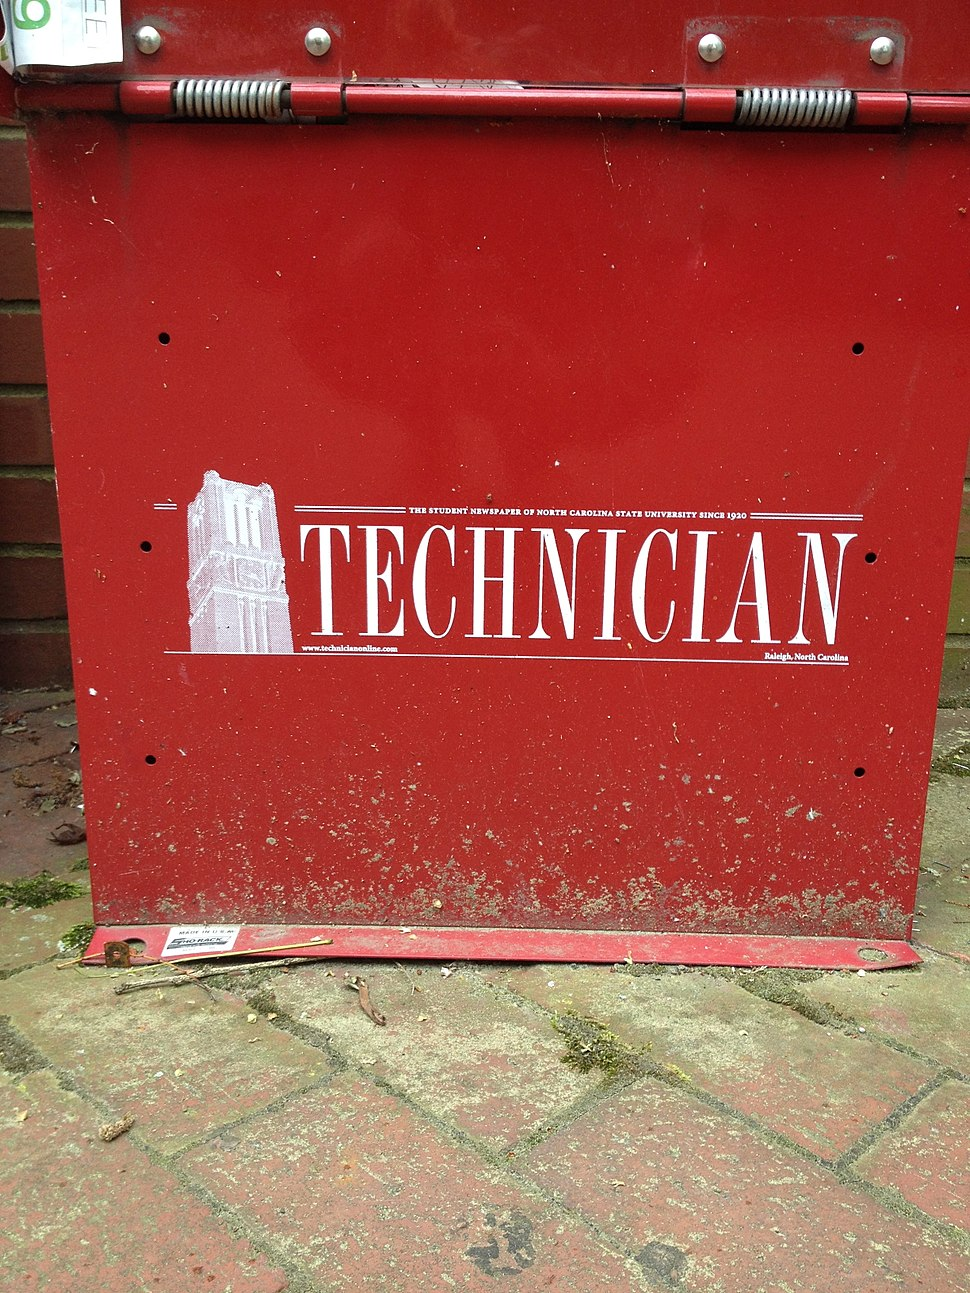 NCSU Technician Newspaper